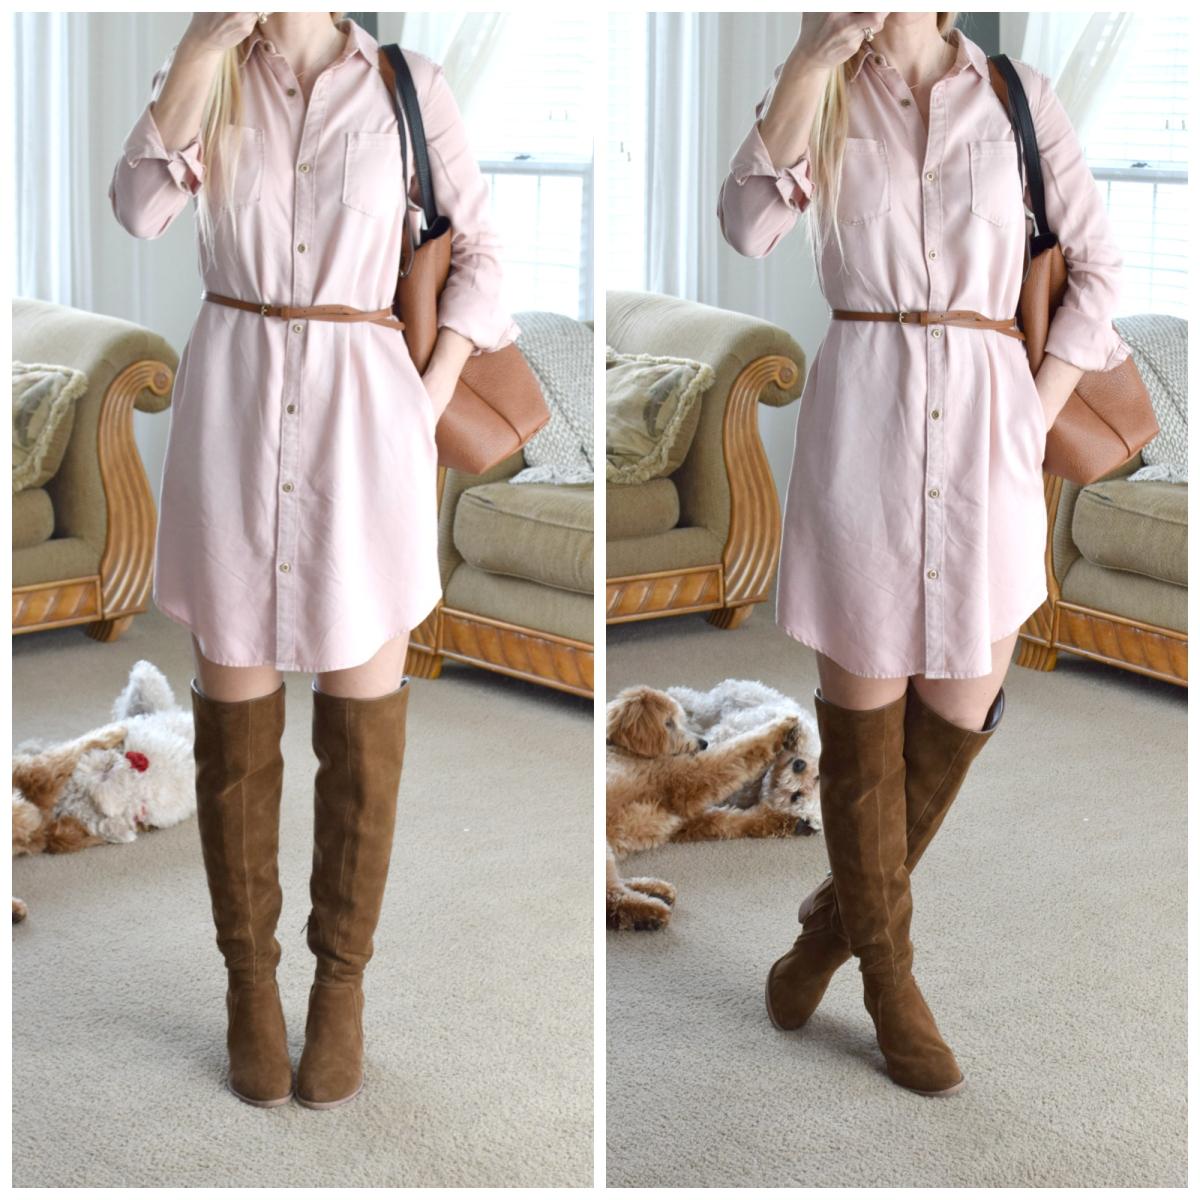 Pink Chambray Dress and OTK boots |www.pearlsandsportsbras.com|